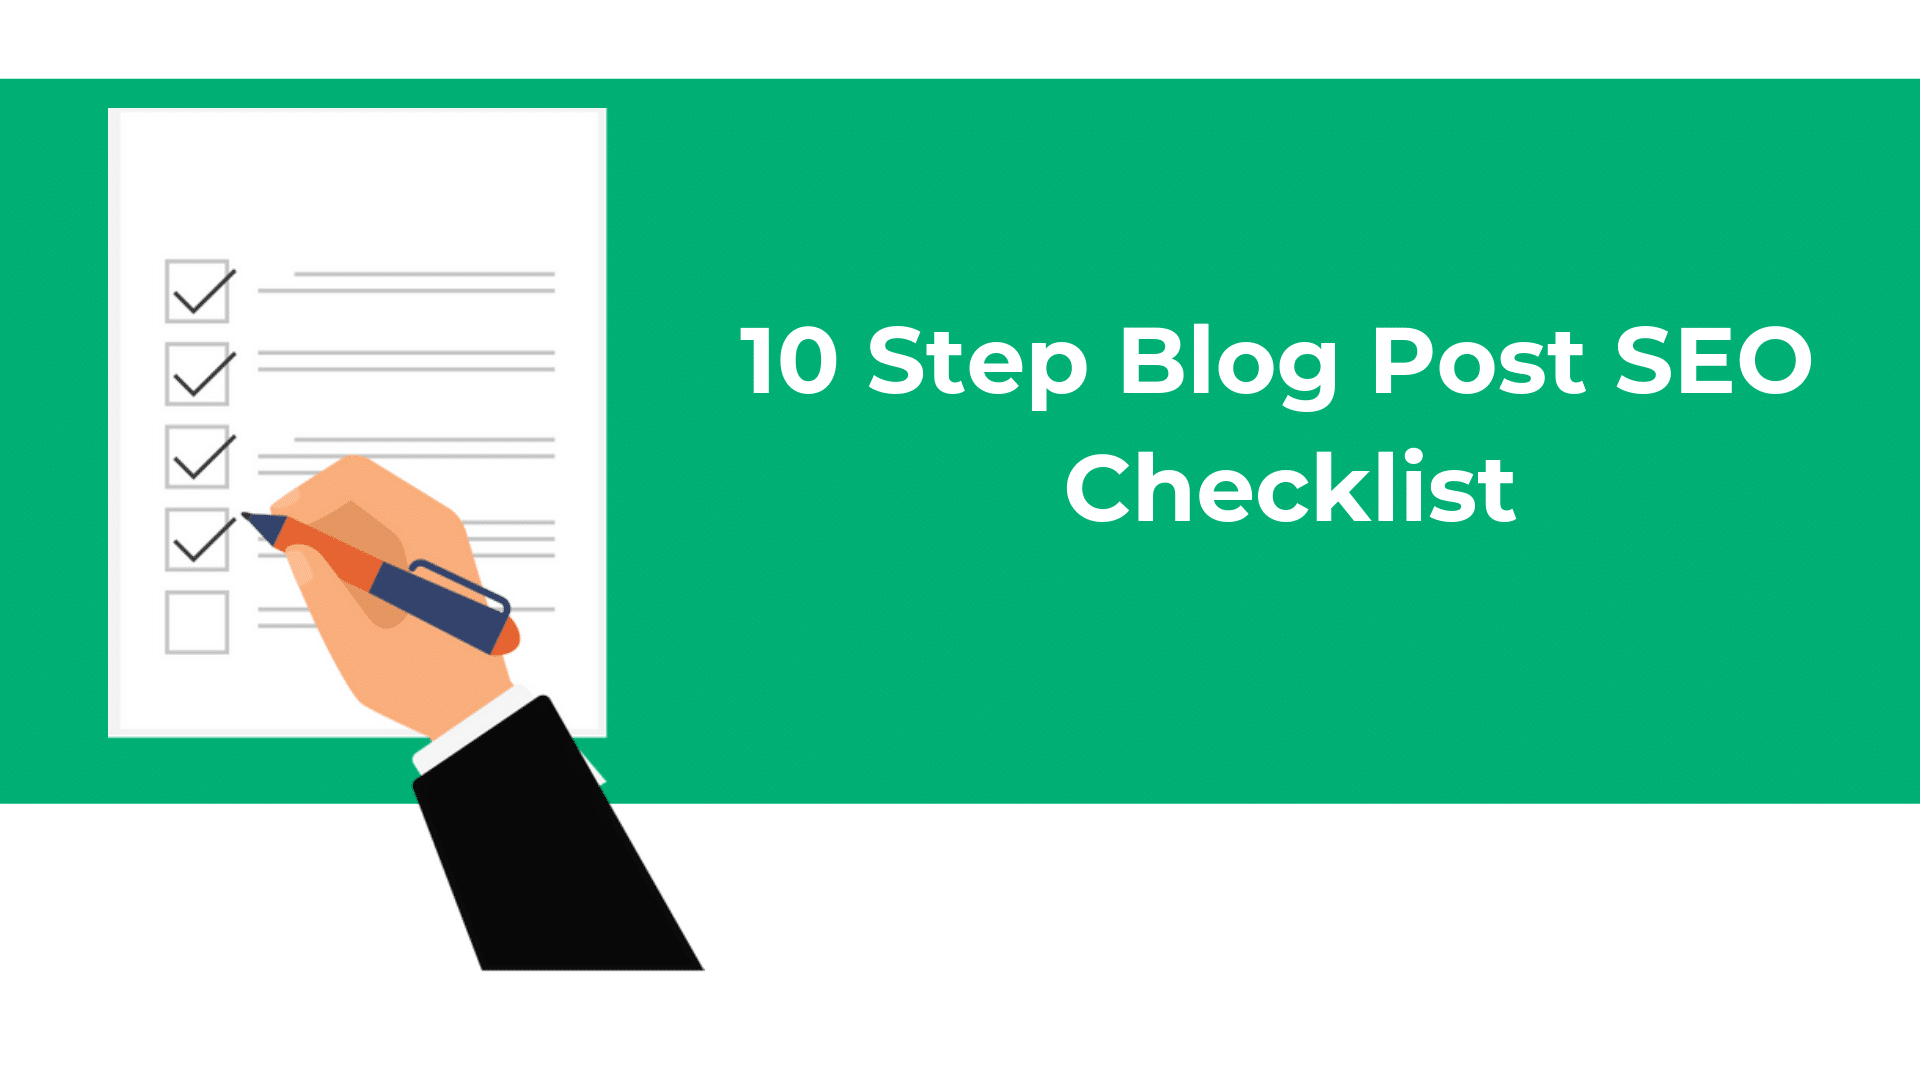 10-Step-SEO-Checklist-For-Blog-Posts-3